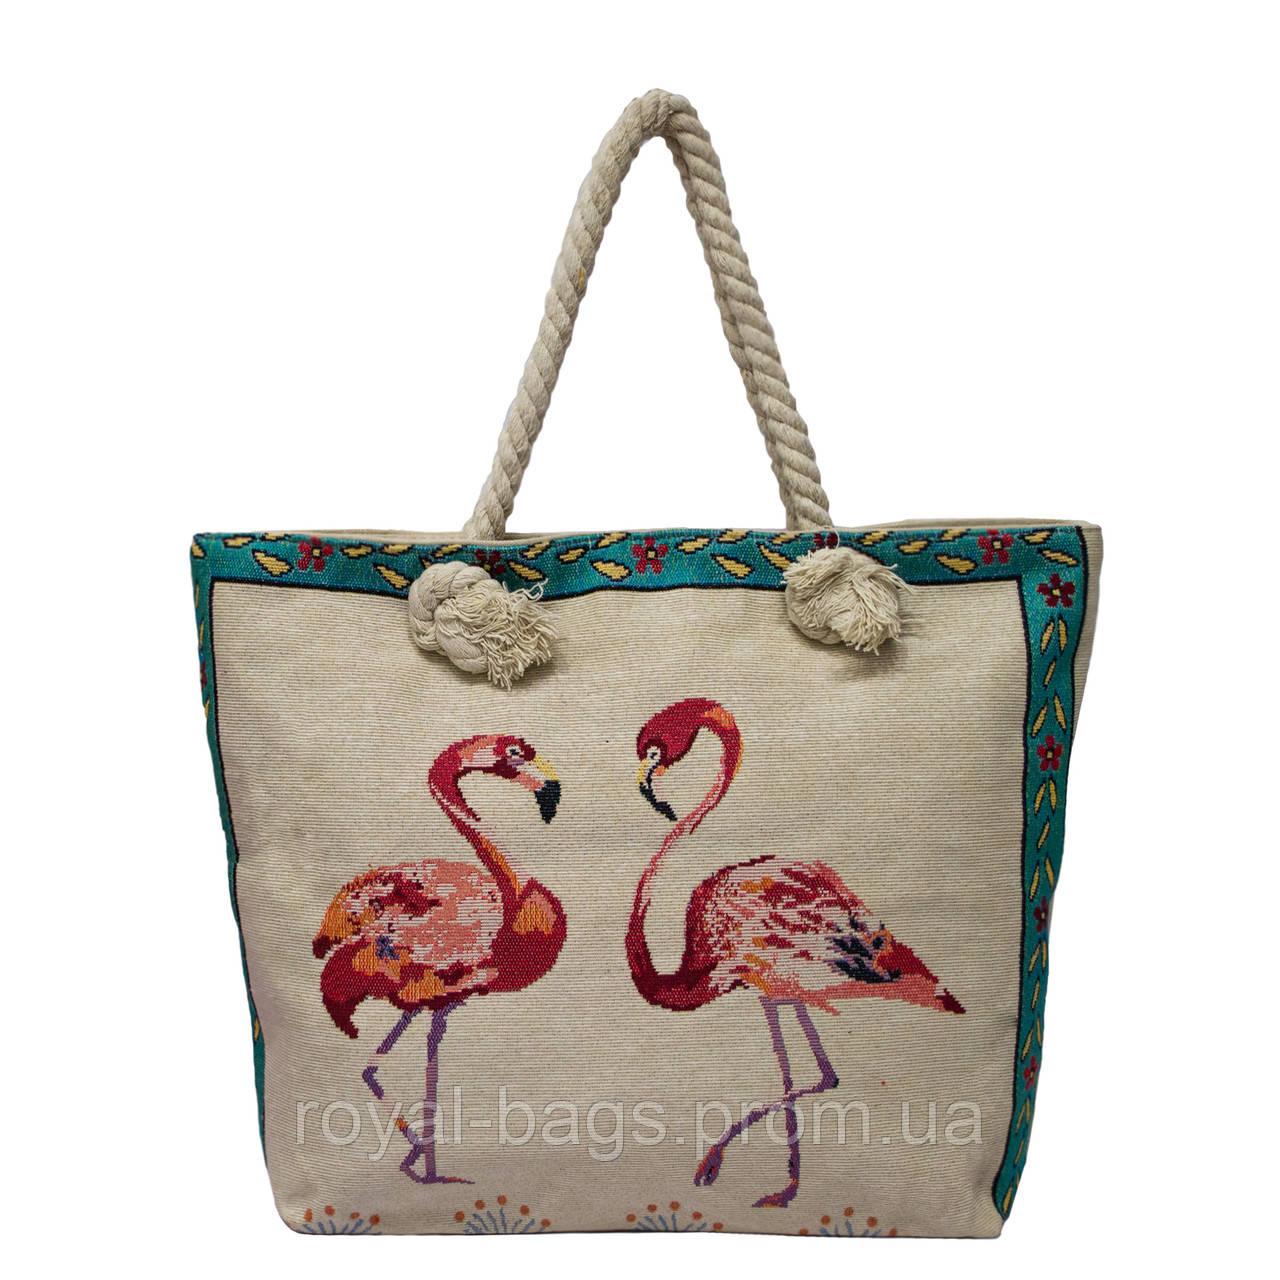 "Летняя сумка с принтами ""Фламинго"" 5 Рисунков"